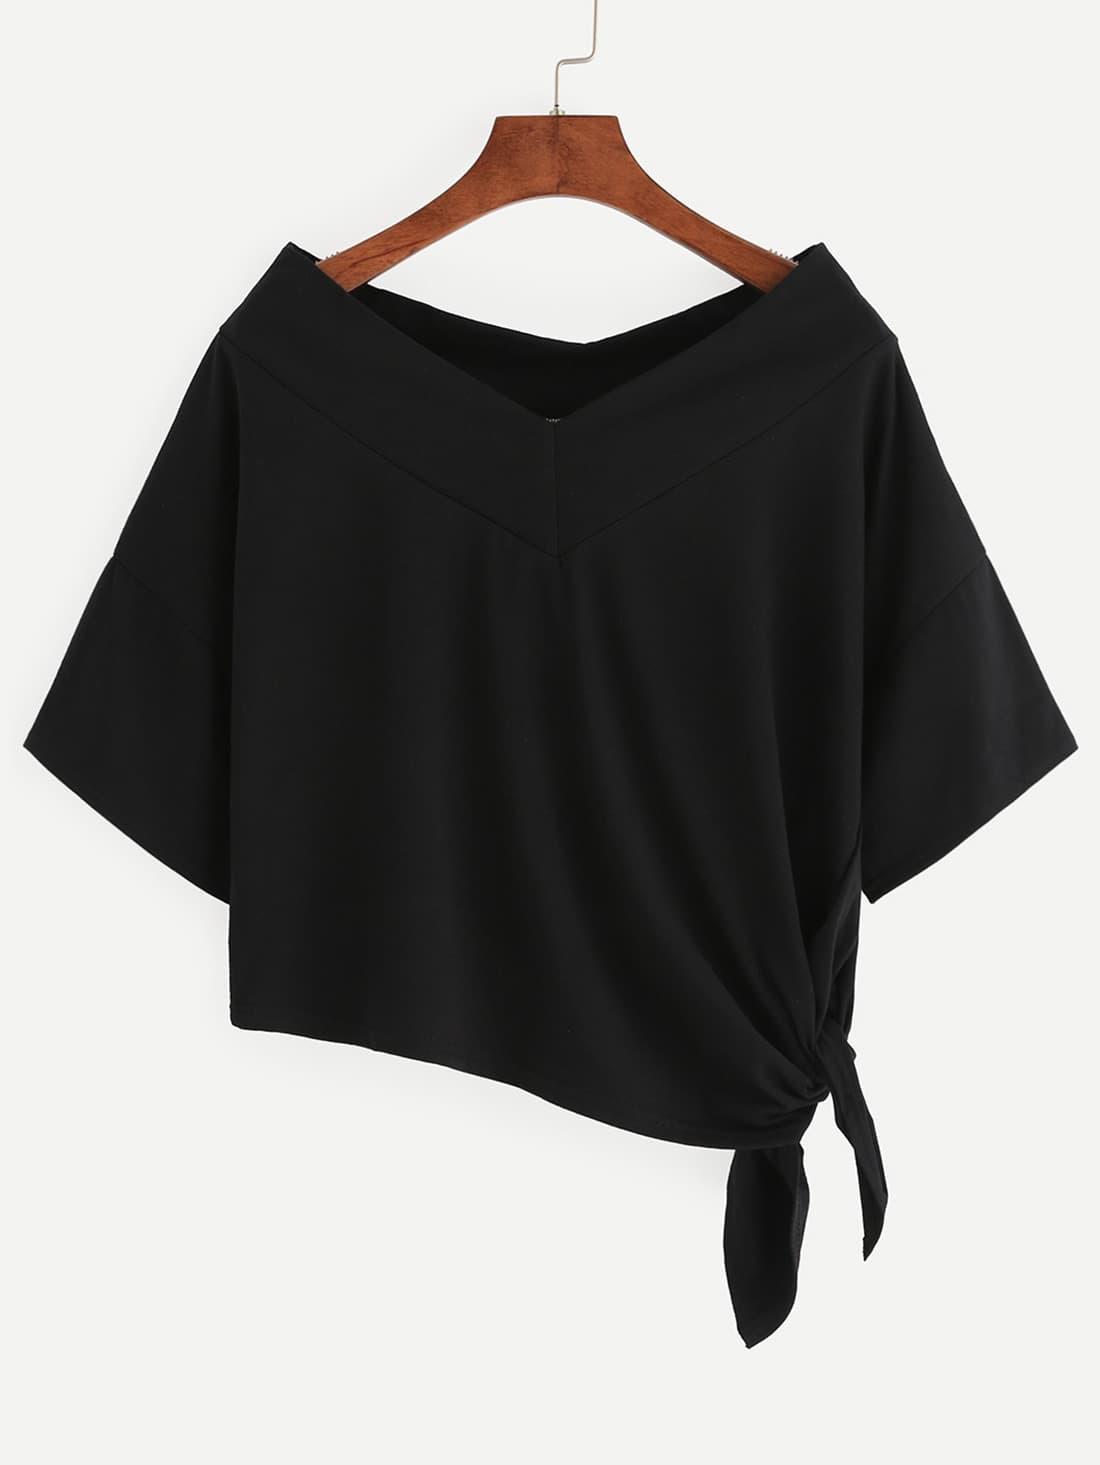 Drop Shoulder Side Tie Asymmetric T-shirt RTSH160614124